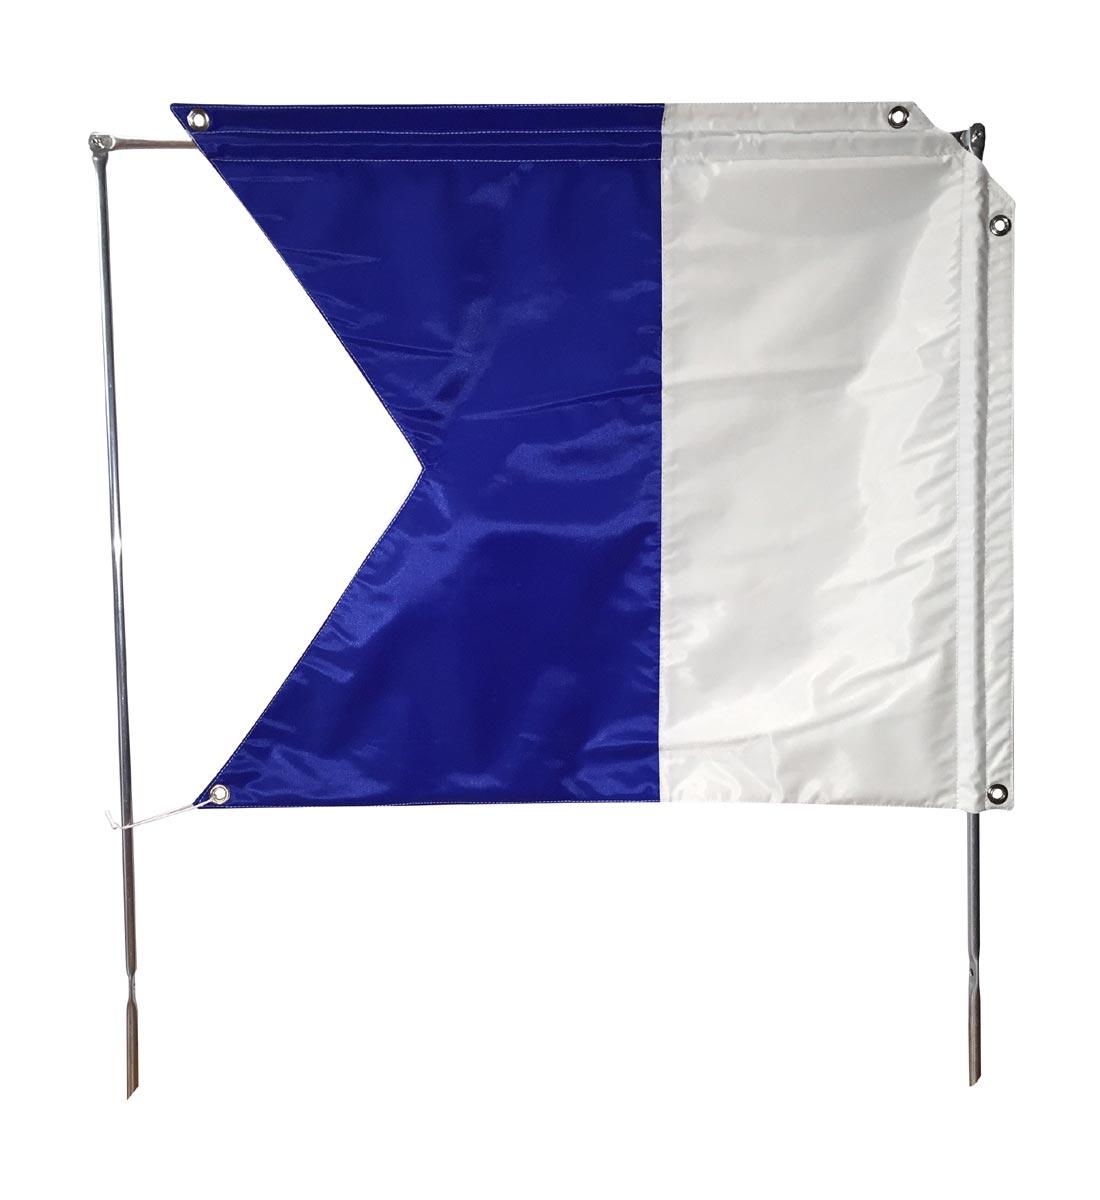 Alpha Flagge für Apnea Boje, Scubapro